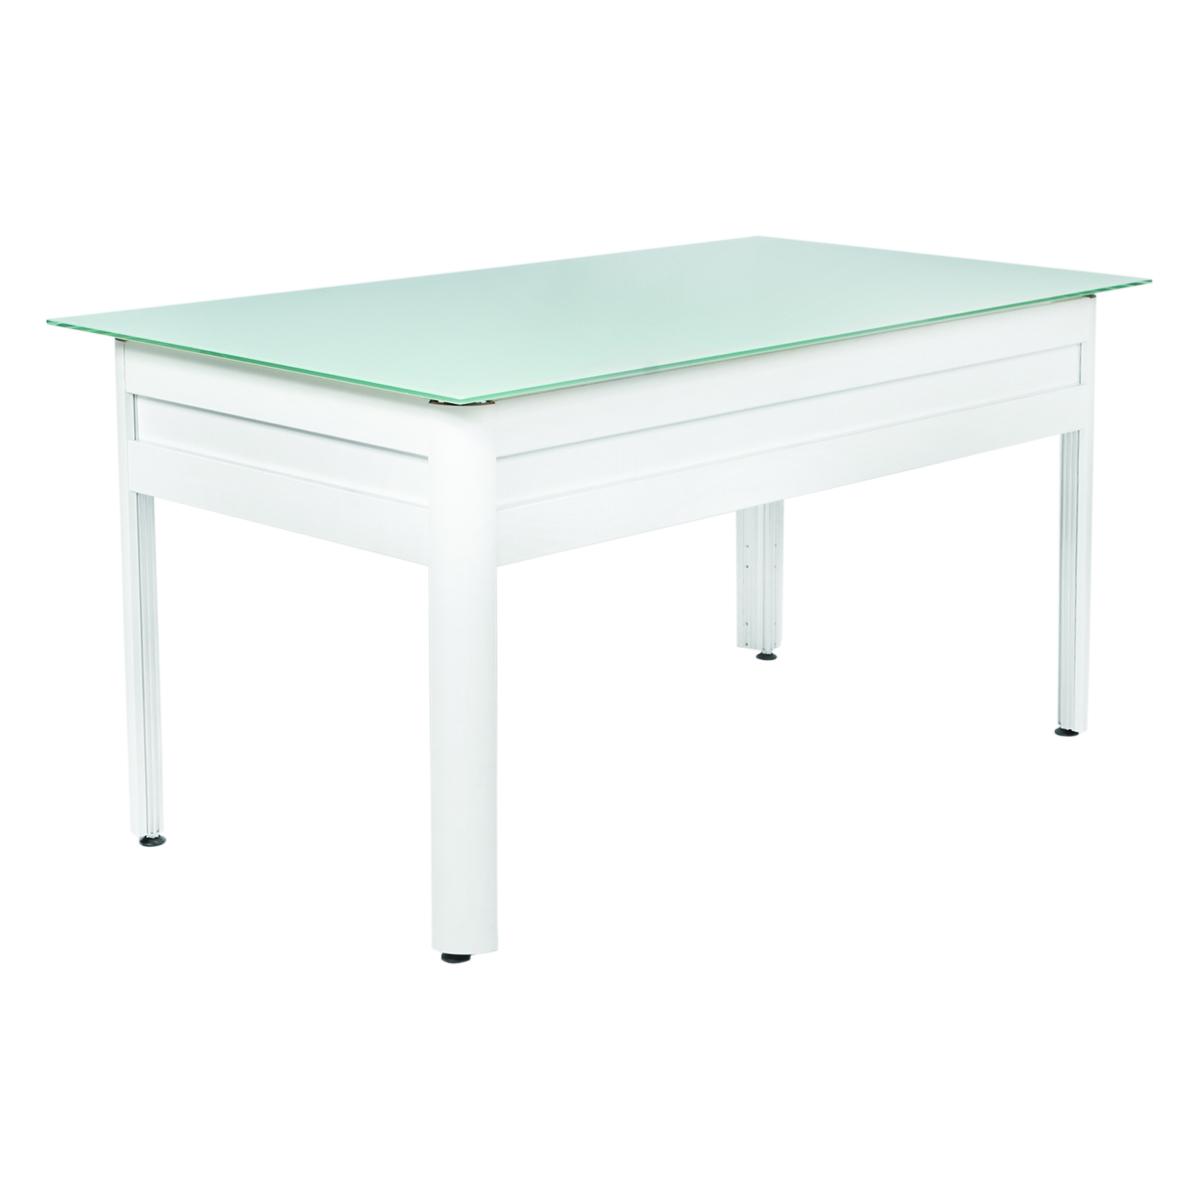 bureau city blanc plateau verre blanc opaque 120x80 internation moduling. Black Bedroom Furniture Sets. Home Design Ideas